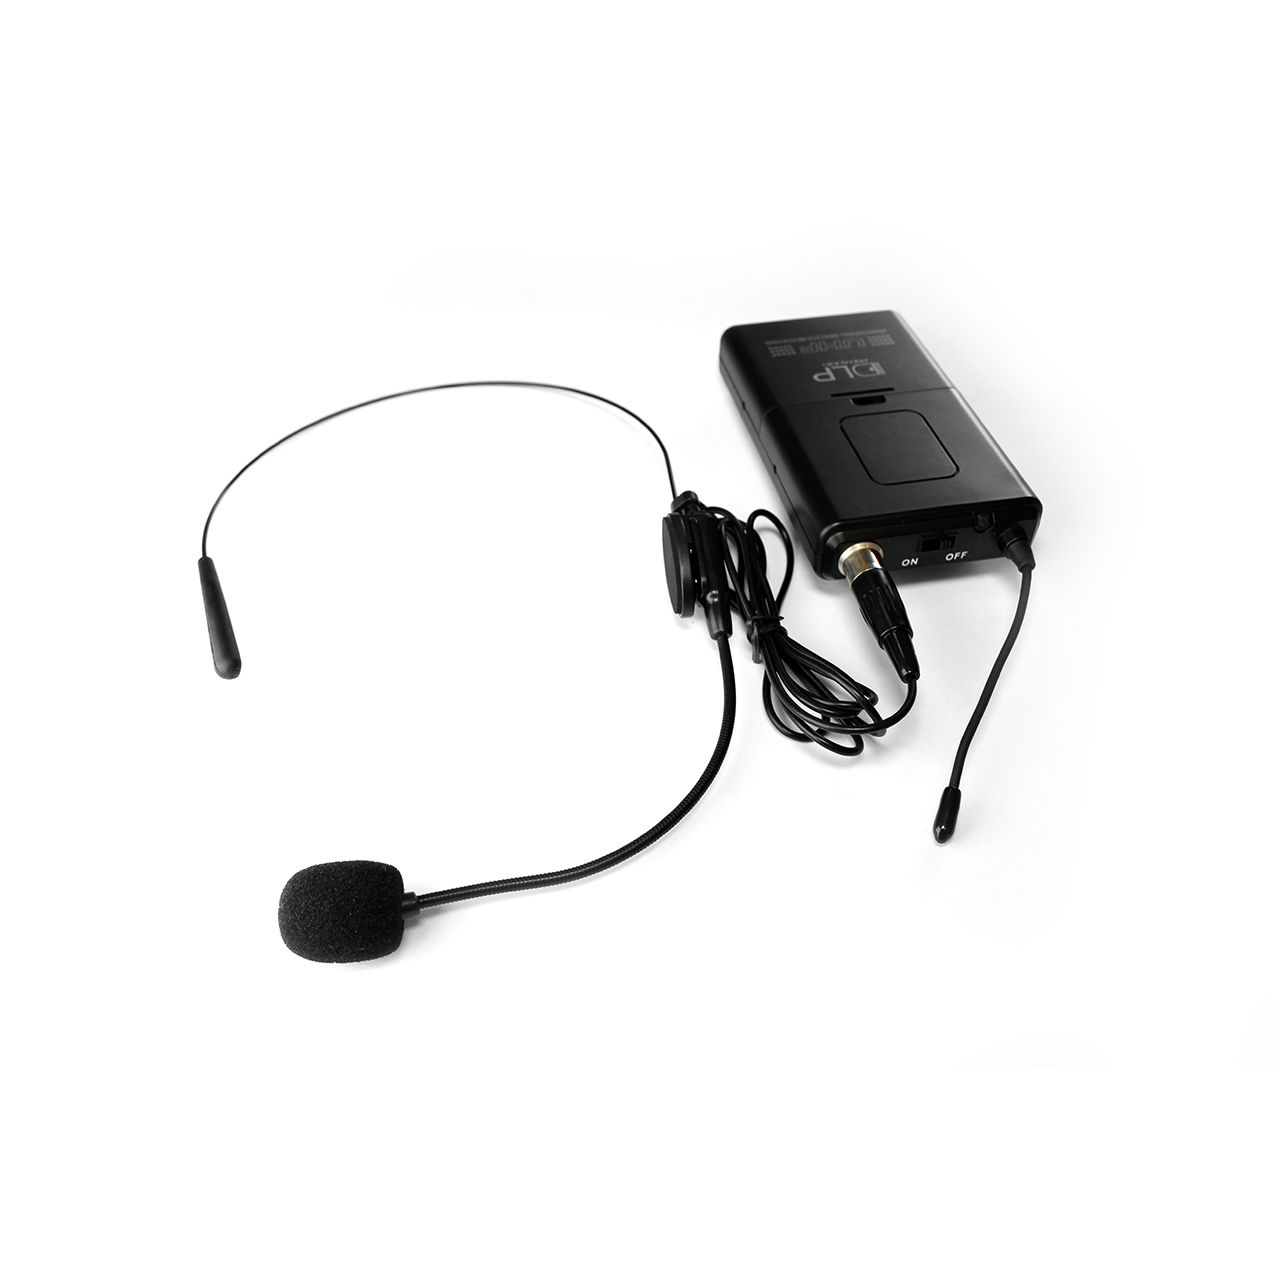 Microfone S/ Fio De Cabeca Hsd 1 Dlp